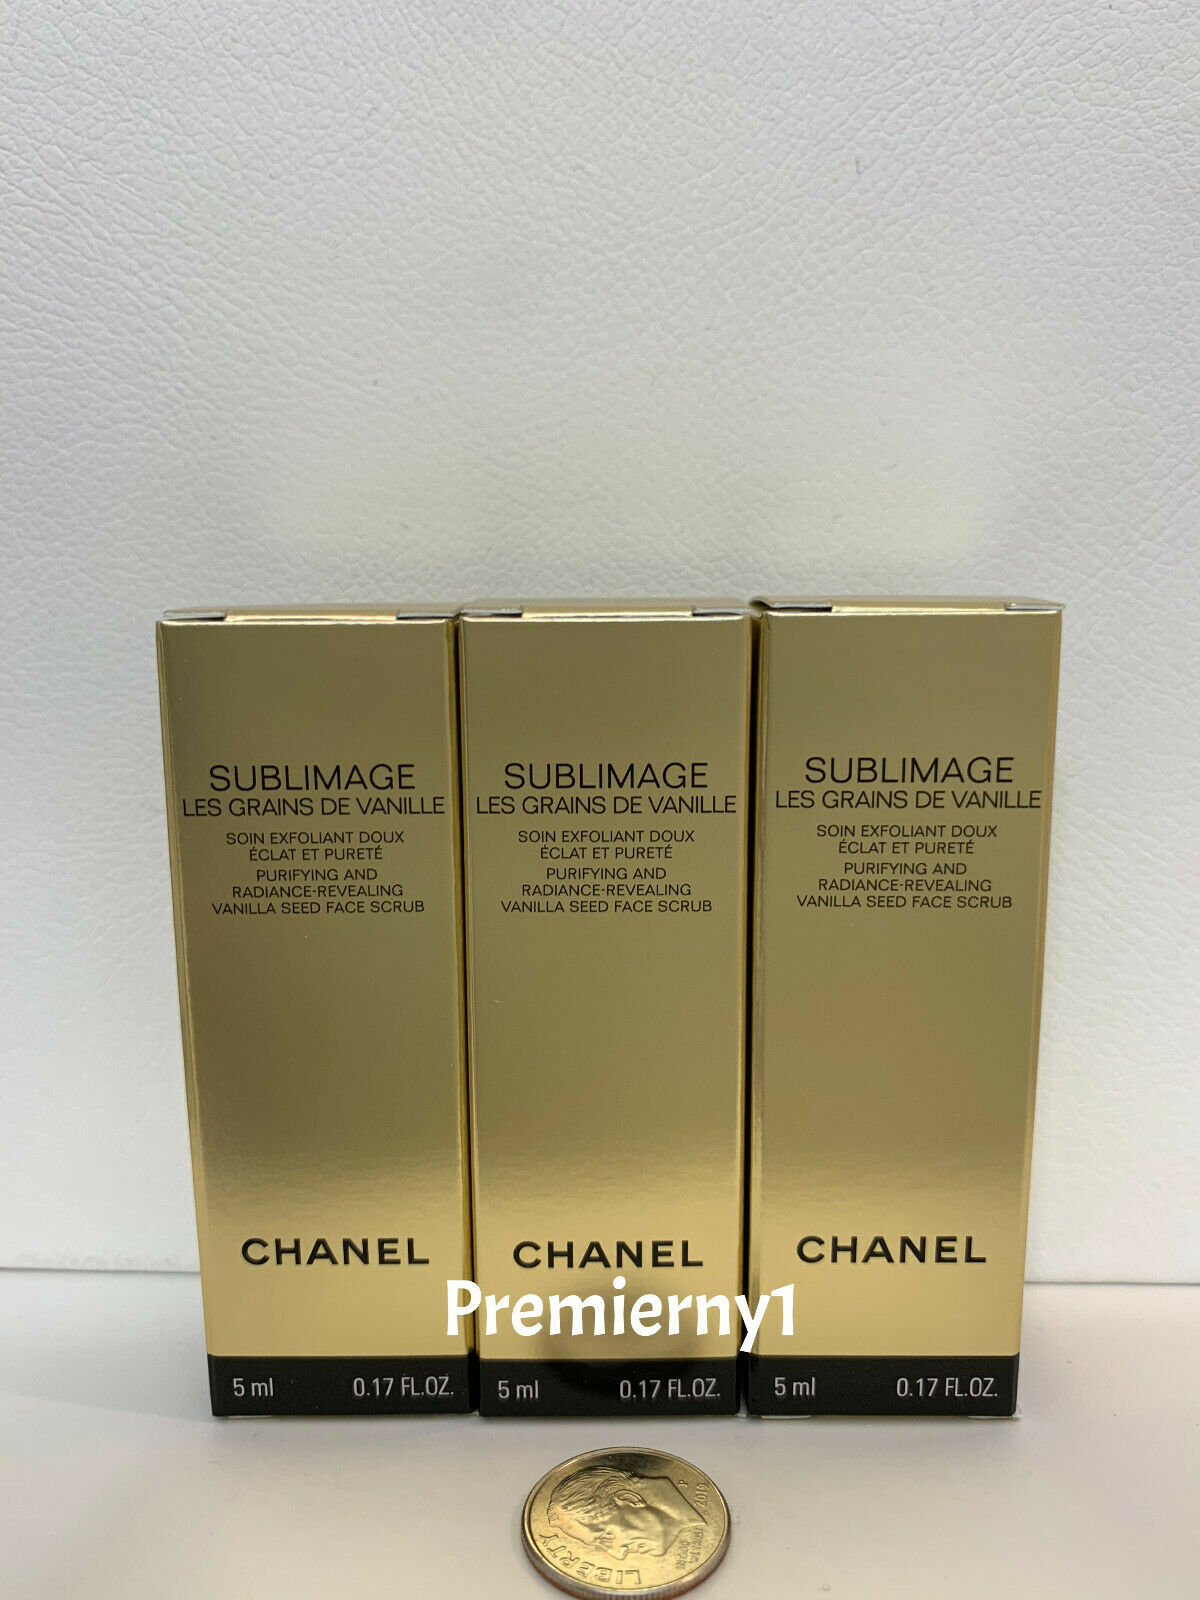 3 Chanel Sublimage Les Grains de Vanille Vanilla Seed Face Scrub 5ml each